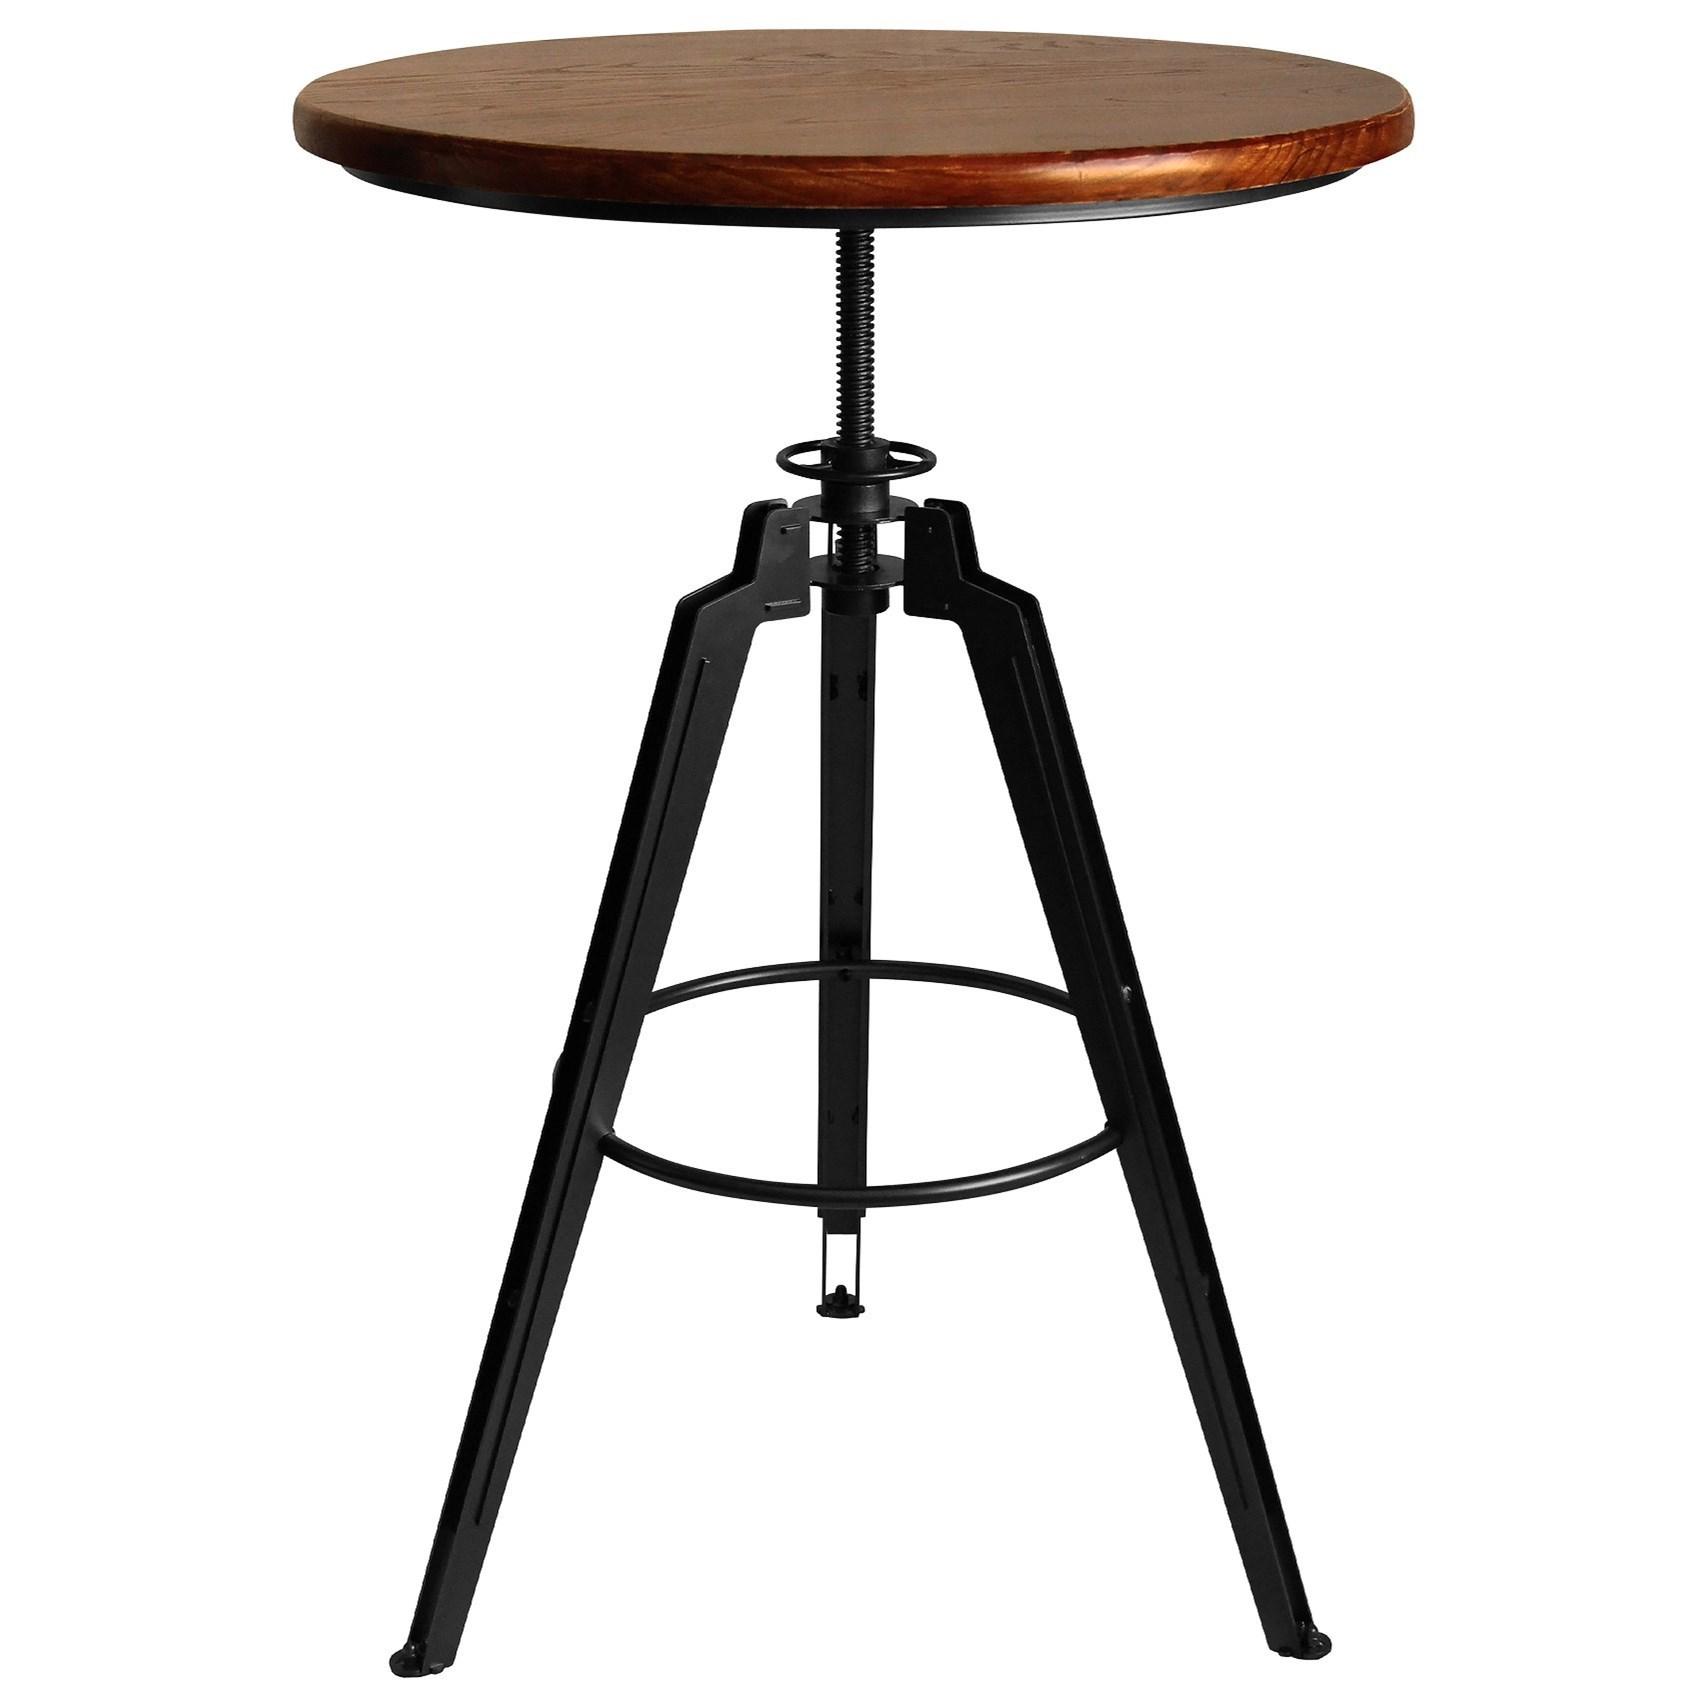 Tribeca Industrial Adjustable Pub Table at Sadler's Home Furnishings